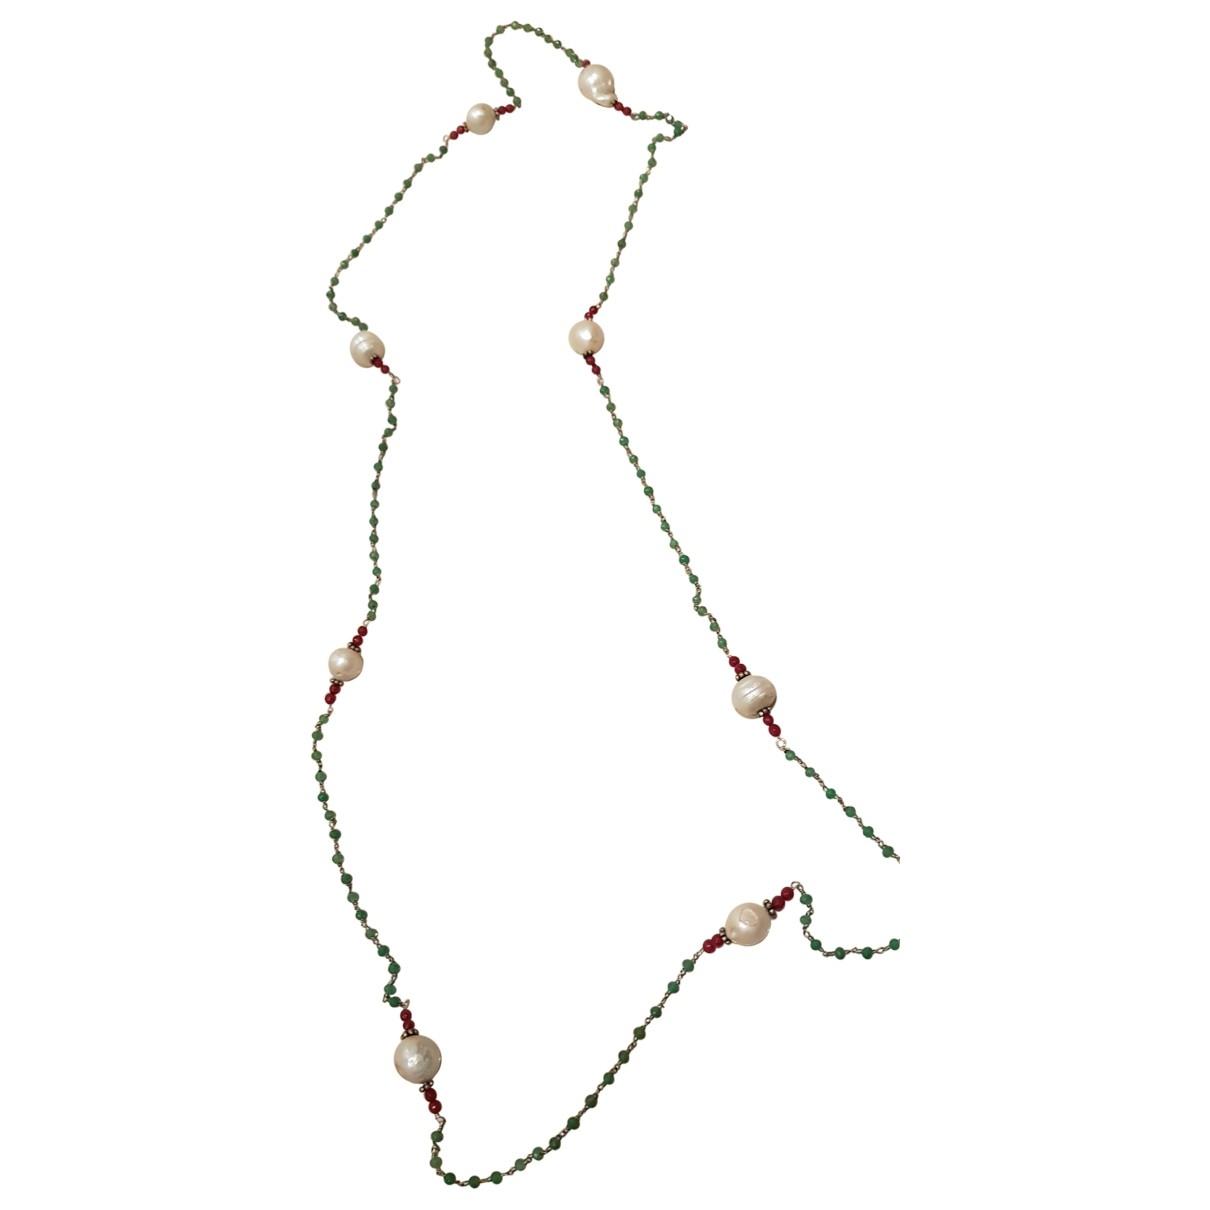 Non Signe / Unsigned Chaines Halskette in  Bunt Perlen